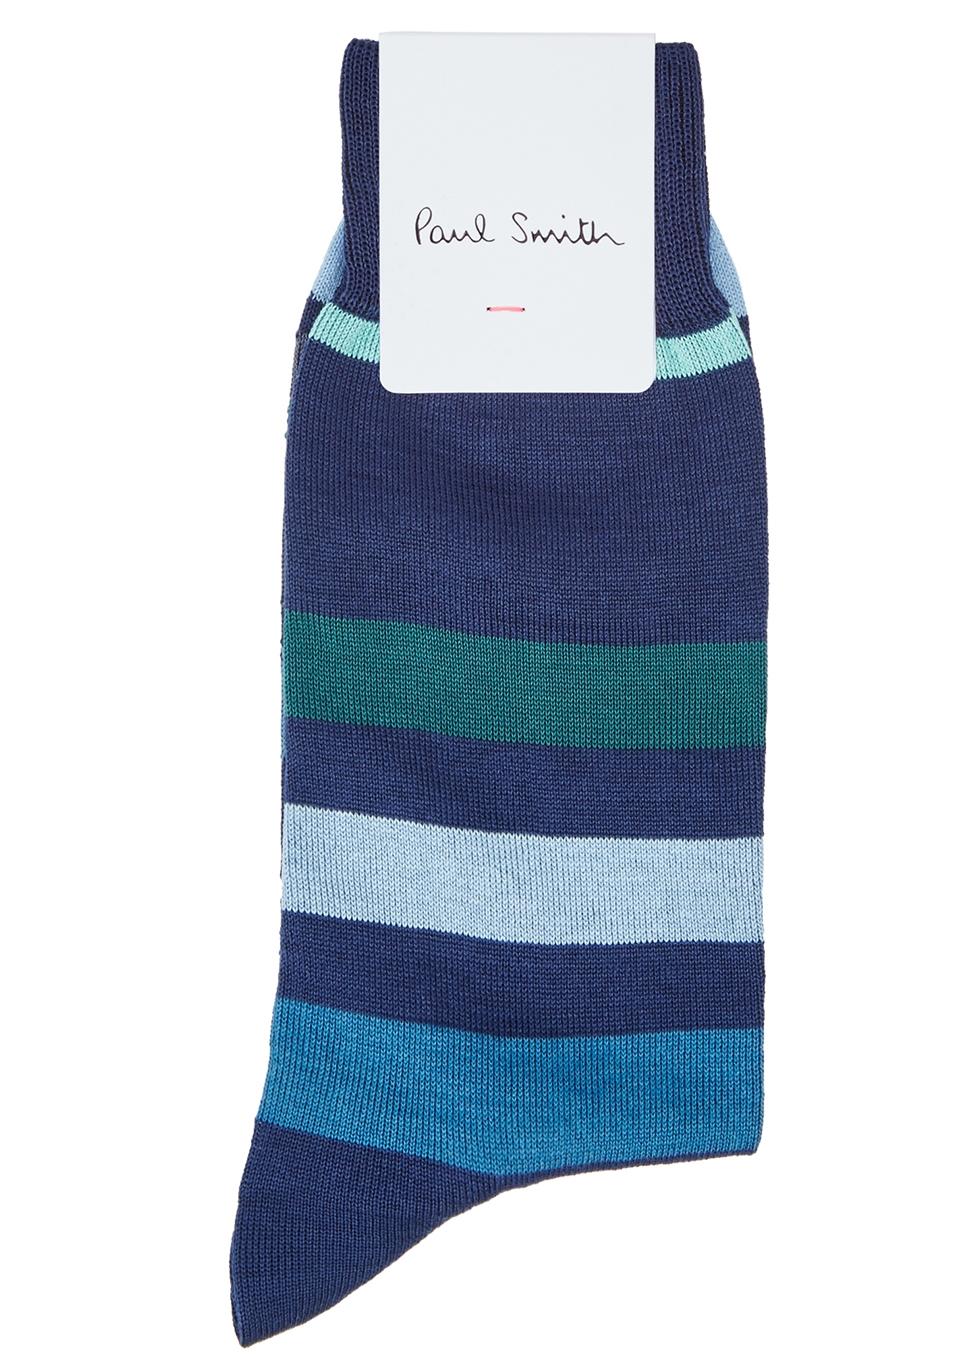 Teaser navy cotton-blend socks - Paul Smith